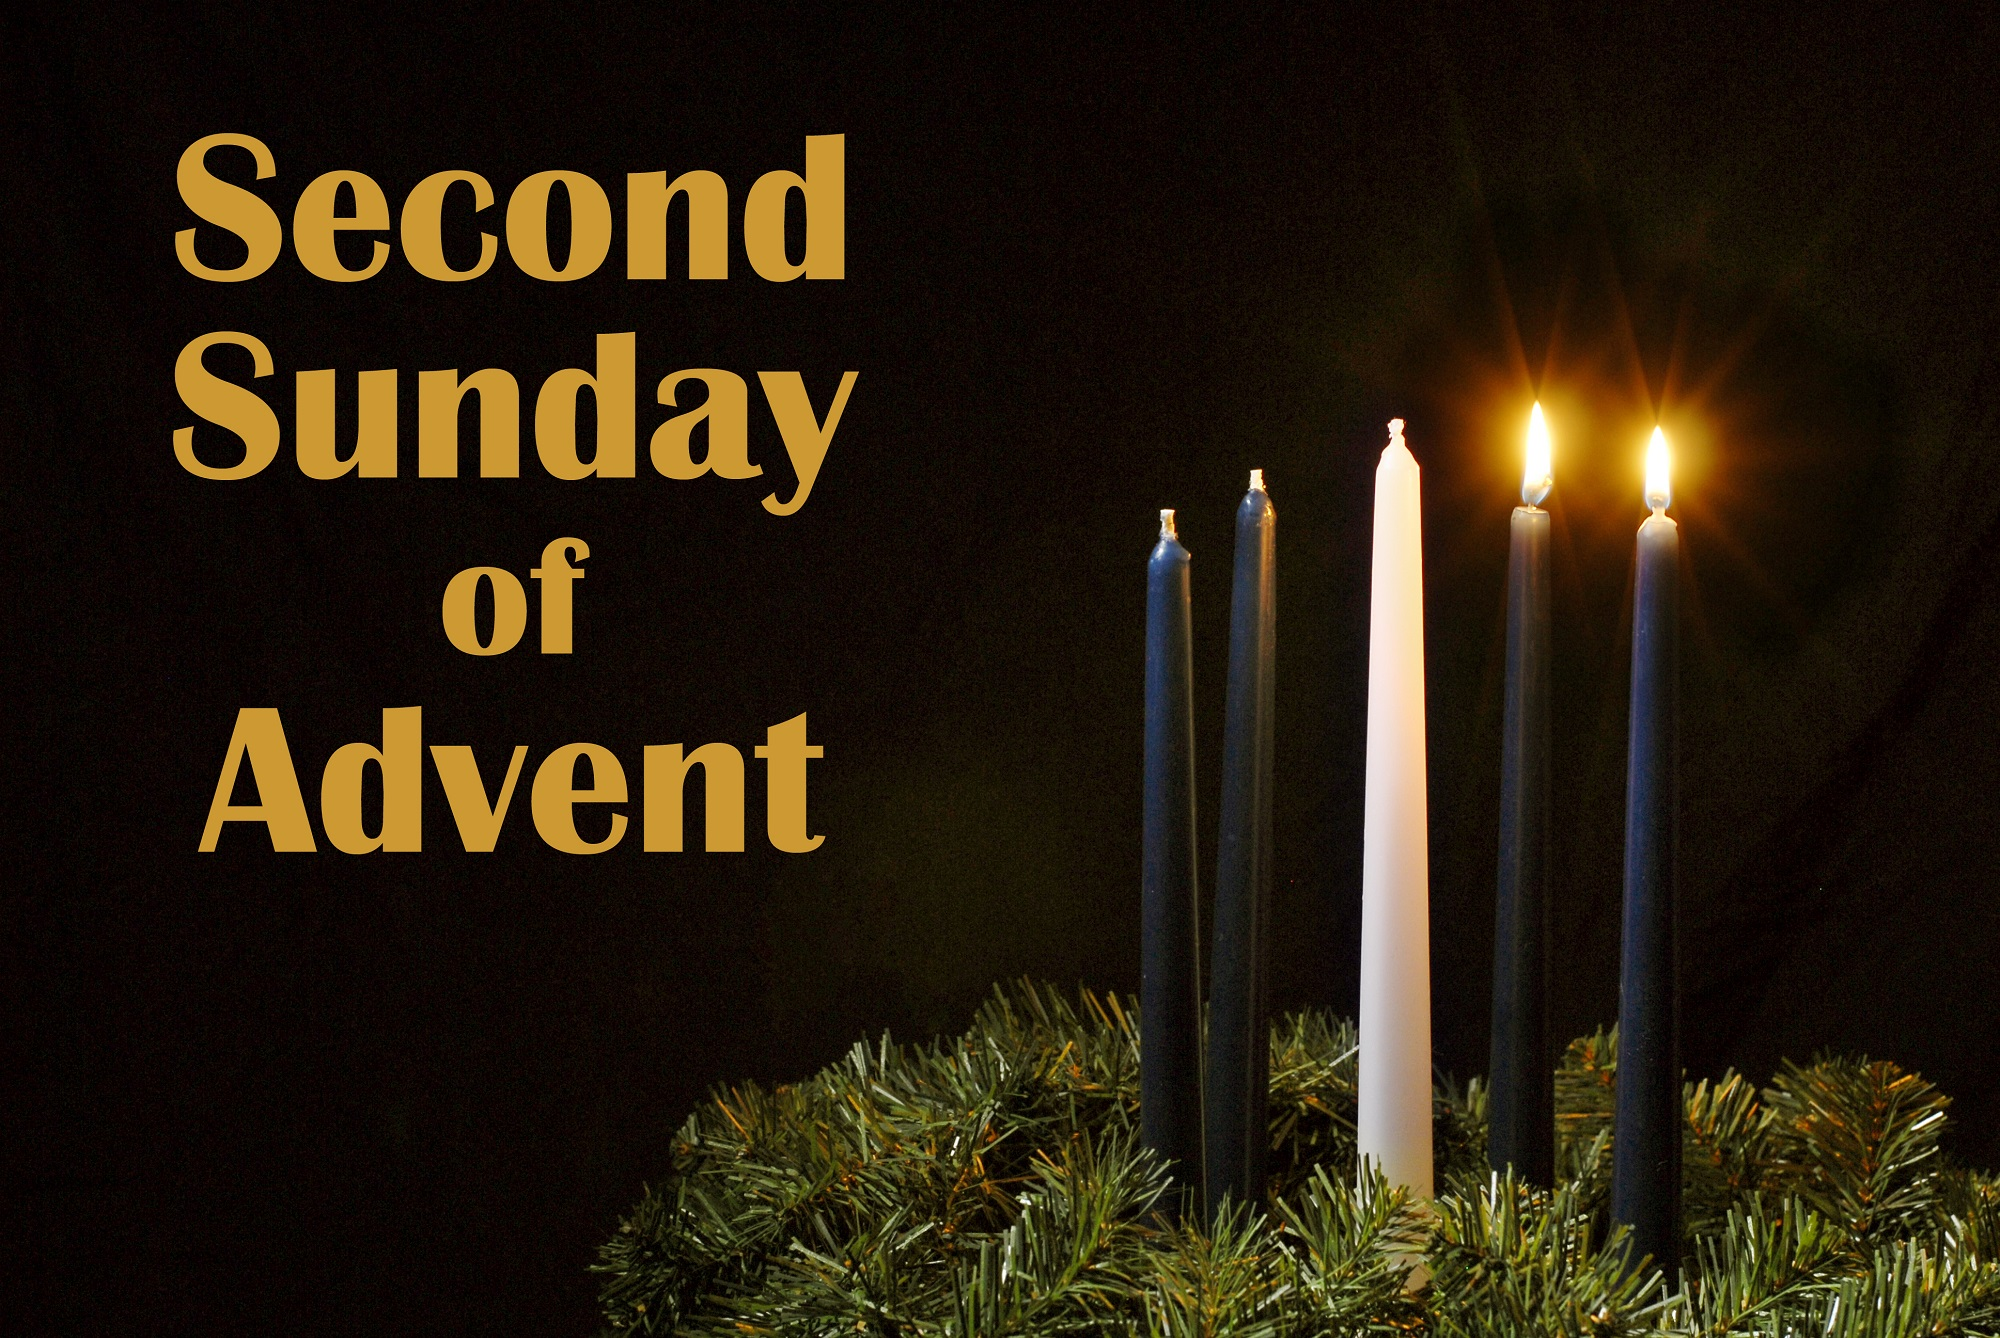 advent second sunday